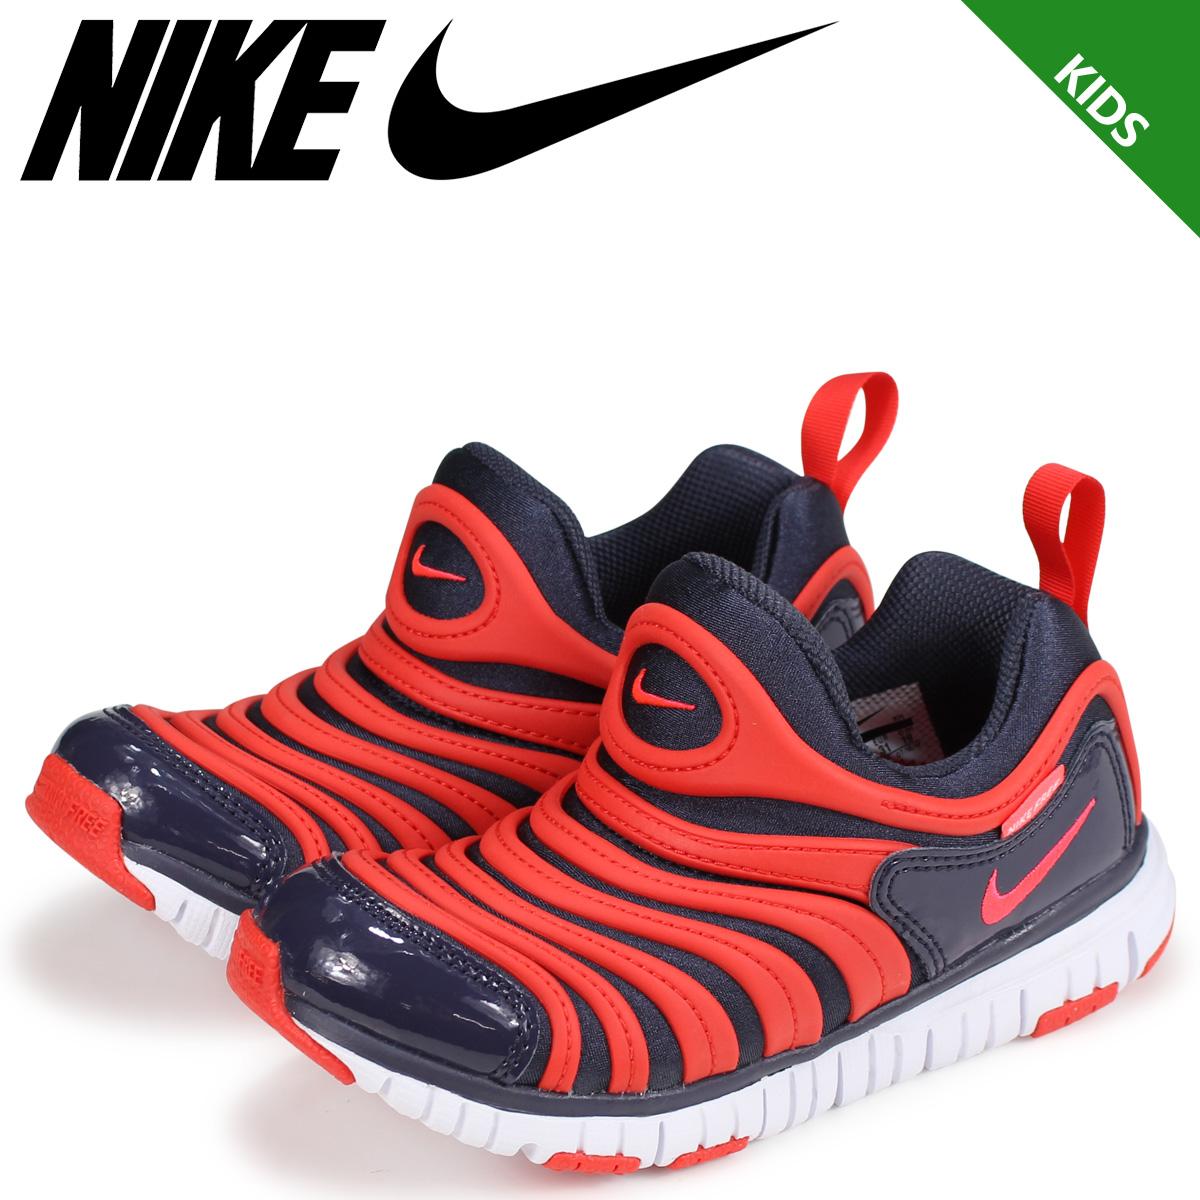 cd7707469b NIKE Nike dynamo-free kids sneakers DYNAMO FREE PS 343,738-015 gray [9/28  Shinnyu load]